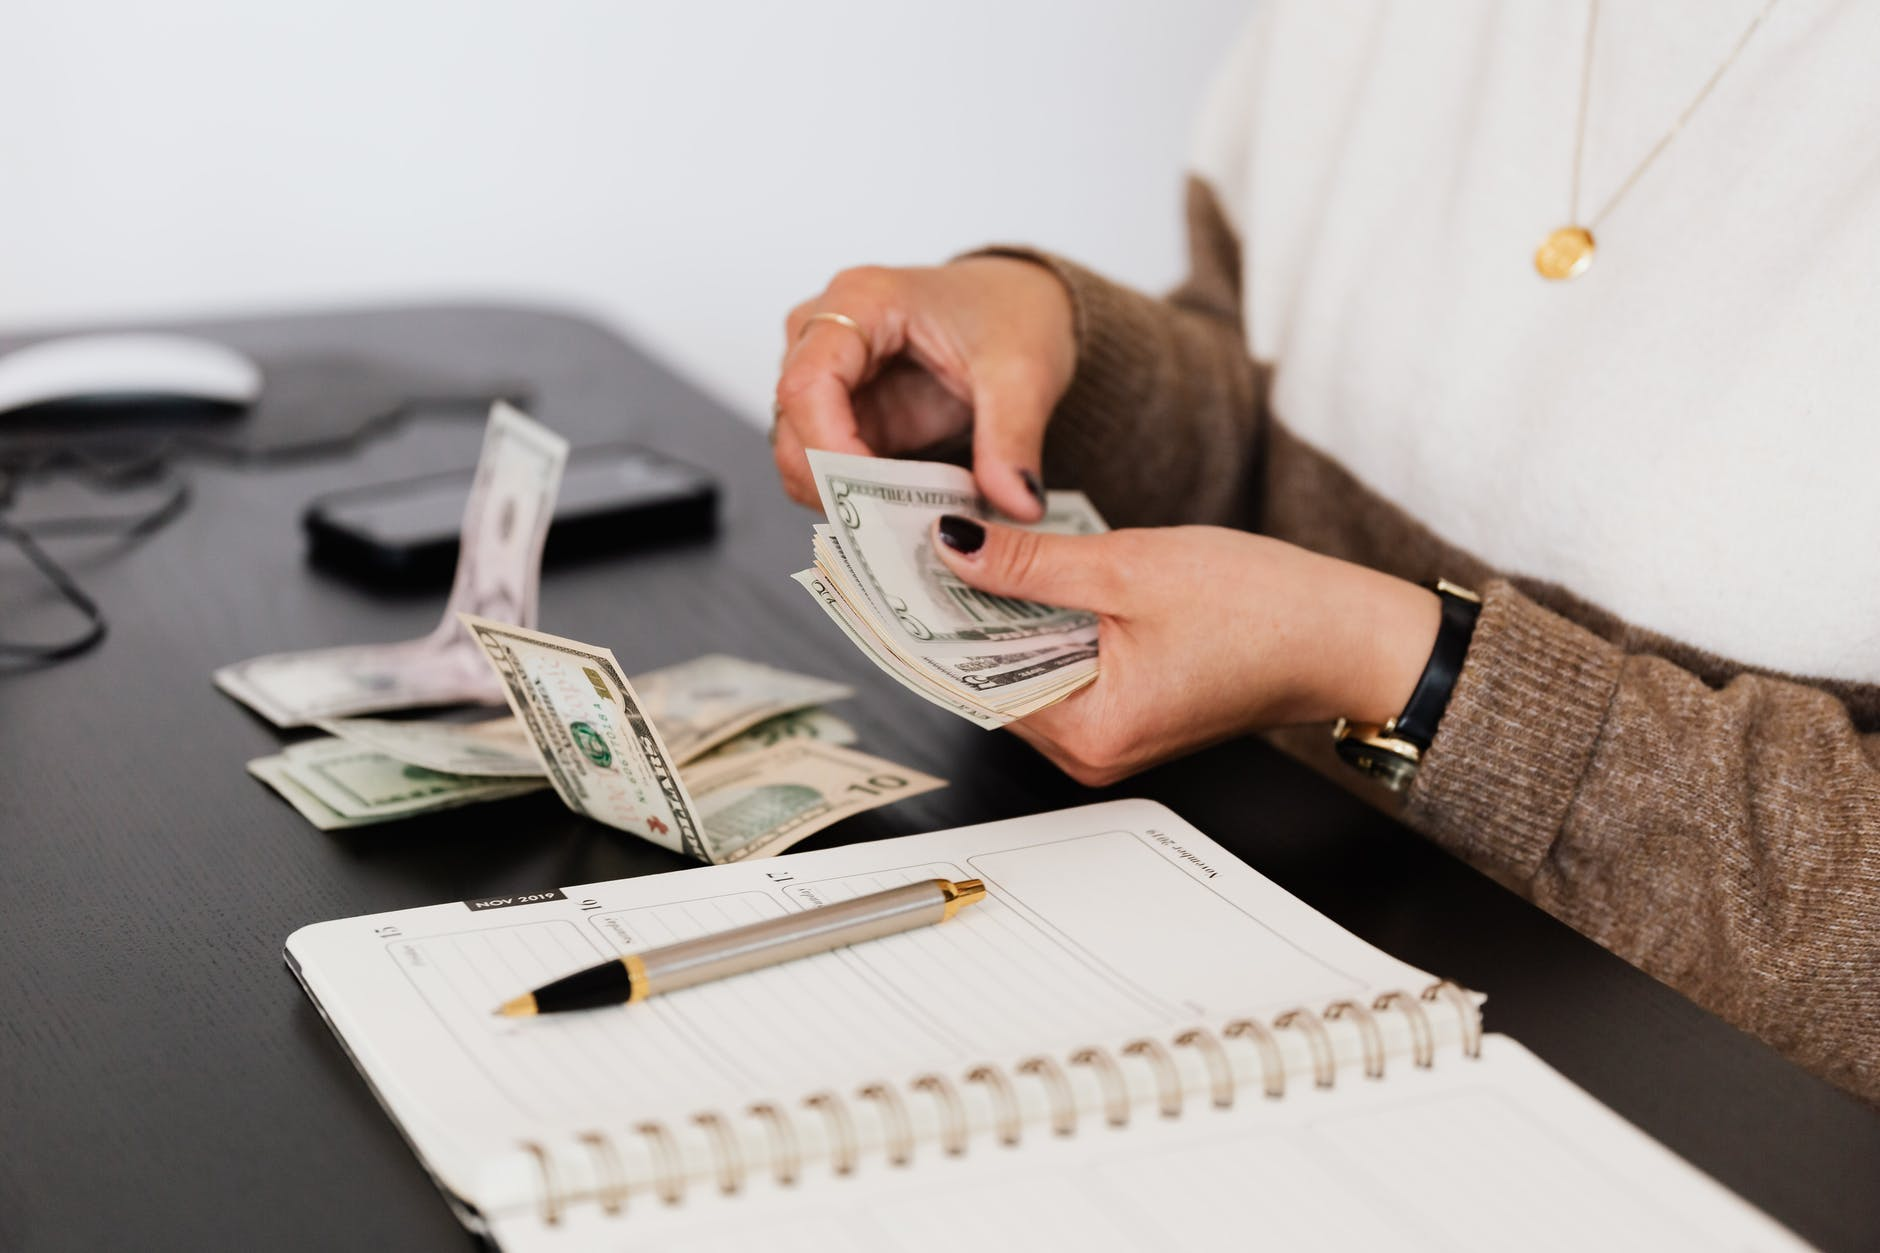 איך ליצור הכנסה פסיבית?